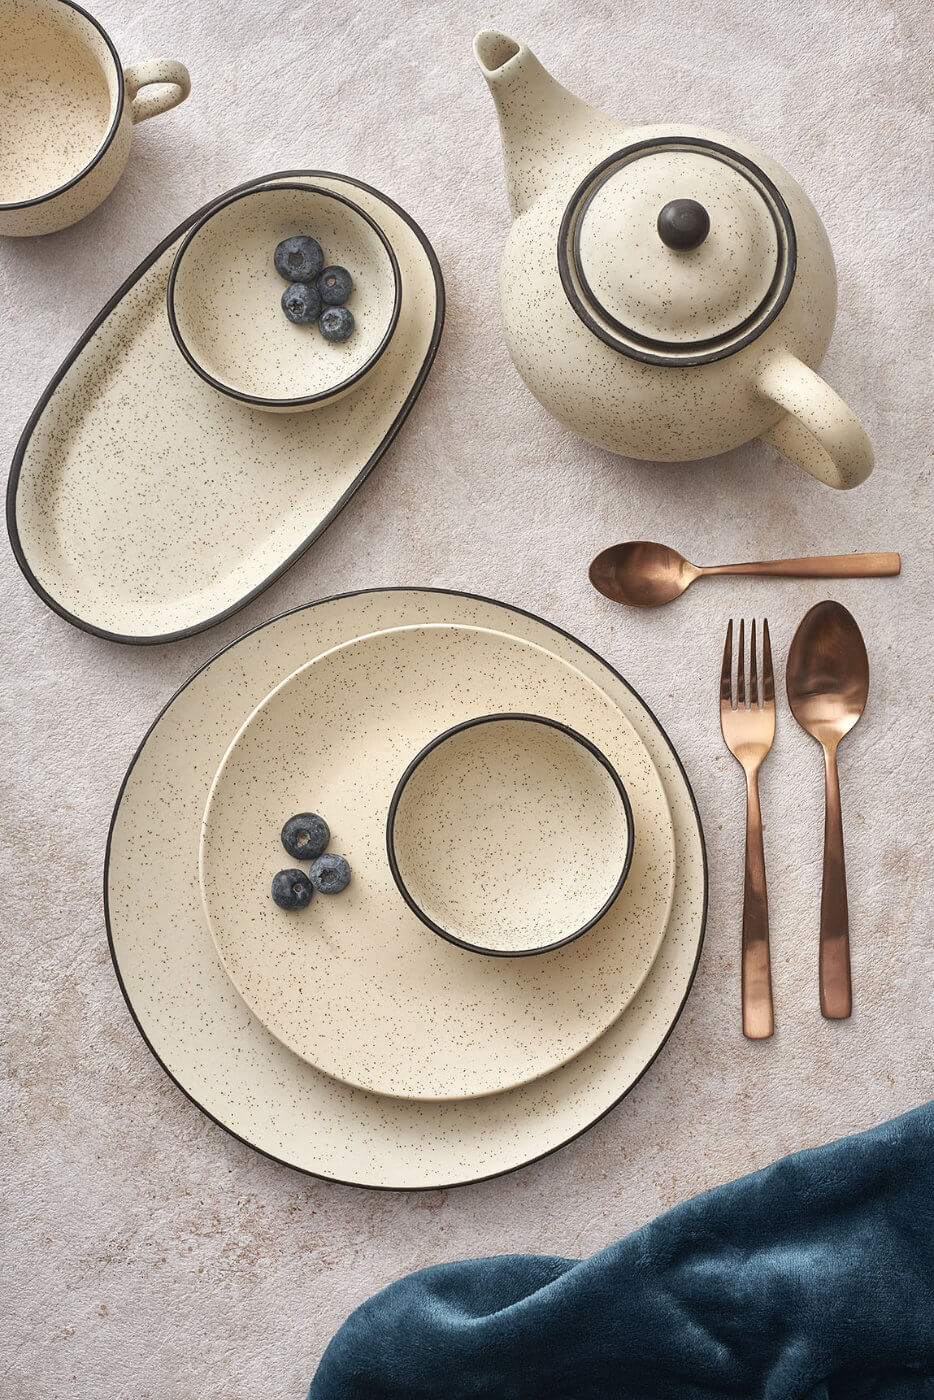 Dining ware